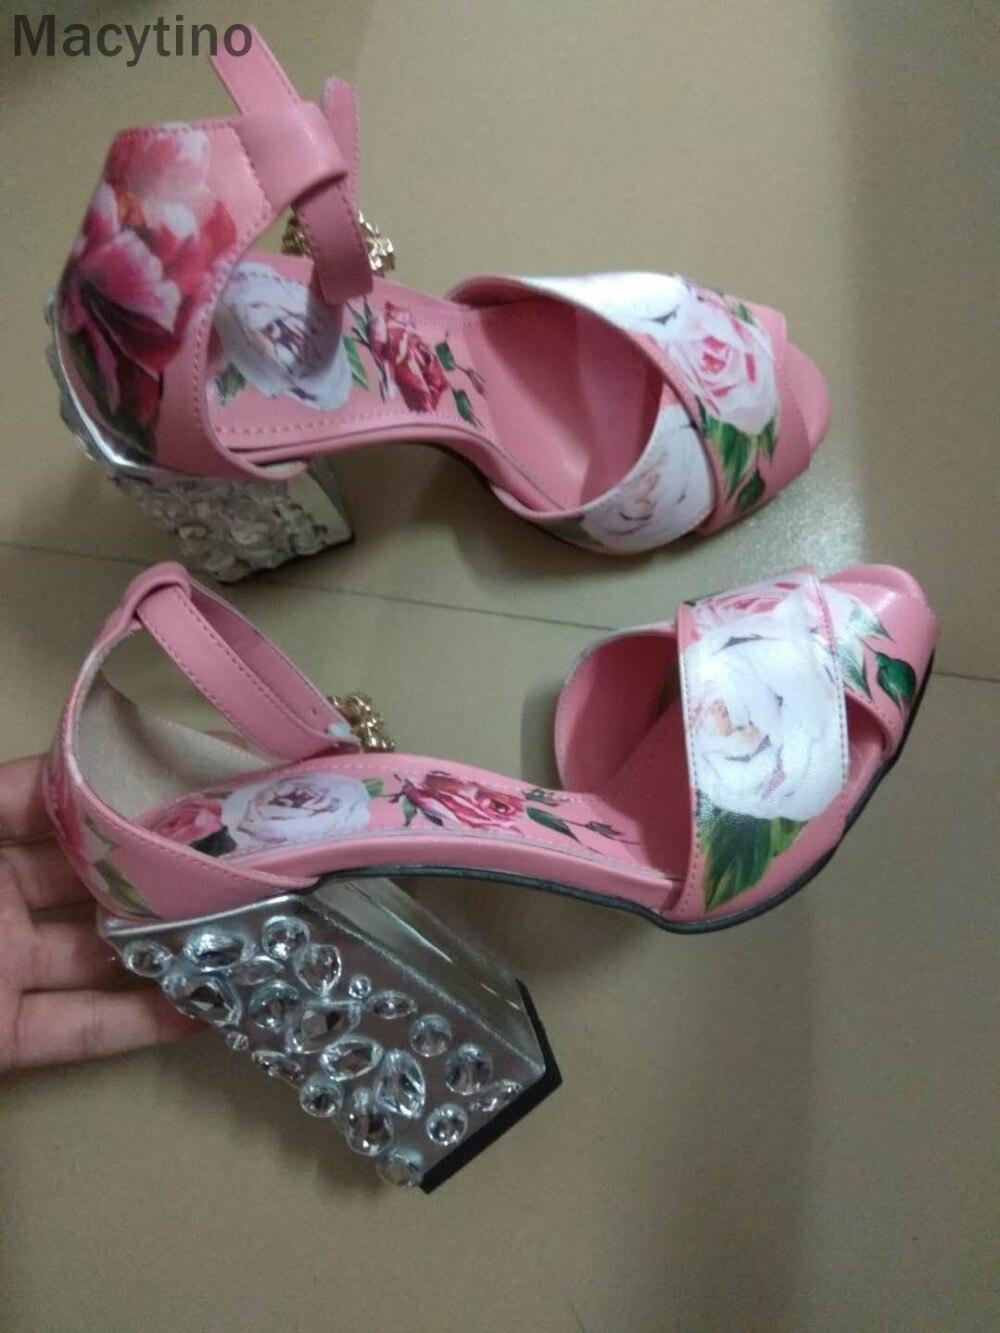 где купить Macytino Flower Printed Sandal Chunky Heels Crystal High Heel Shoes Summer Casual Sandals Real Pictures по лучшей цене